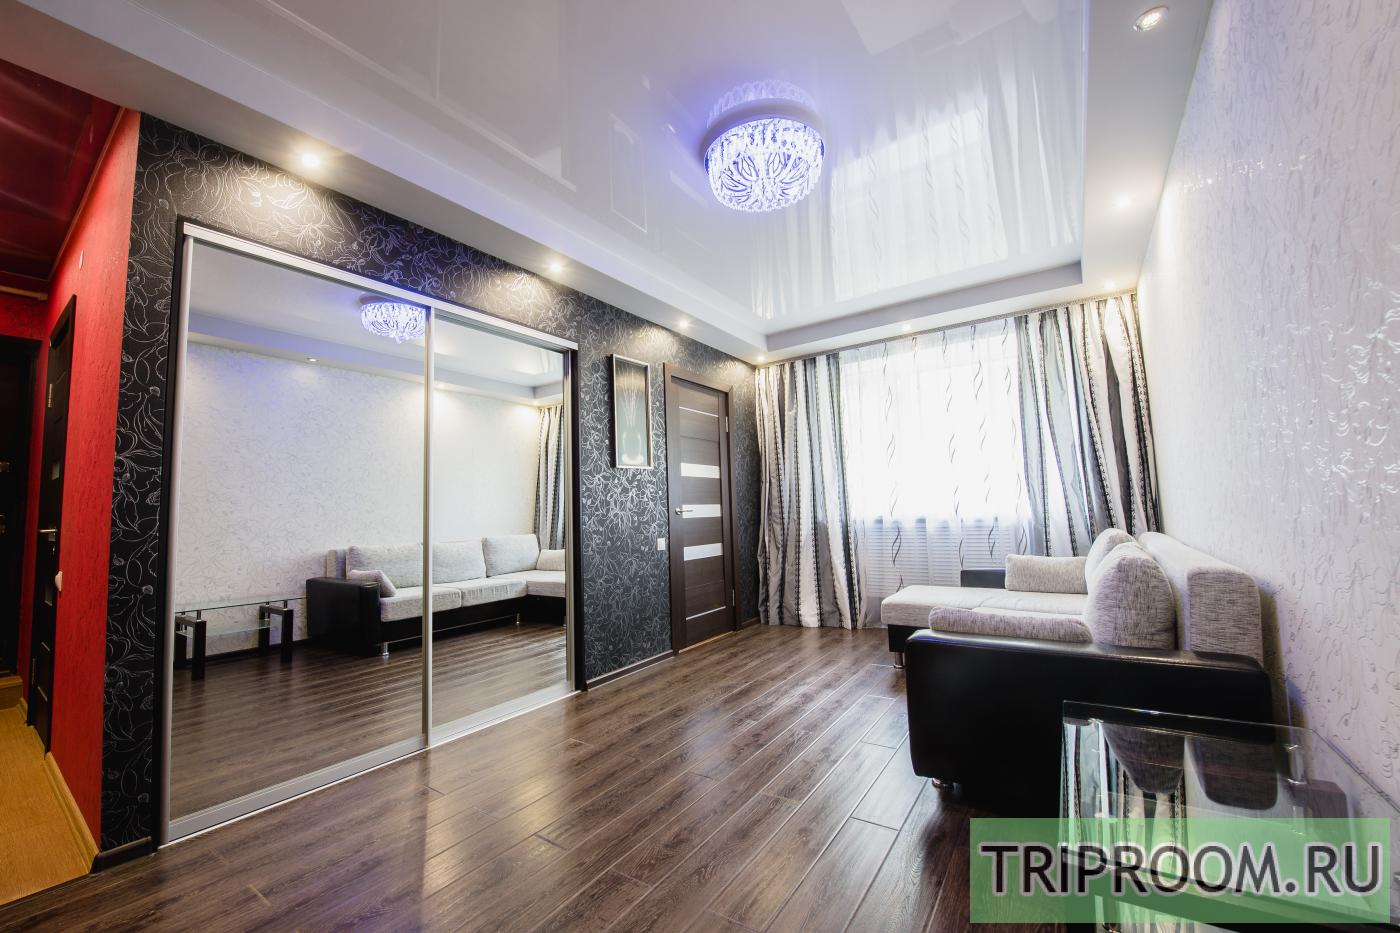 1-комнатная квартира посуточно (вариант № 14780), ул. Шевченко улица, фото № 1